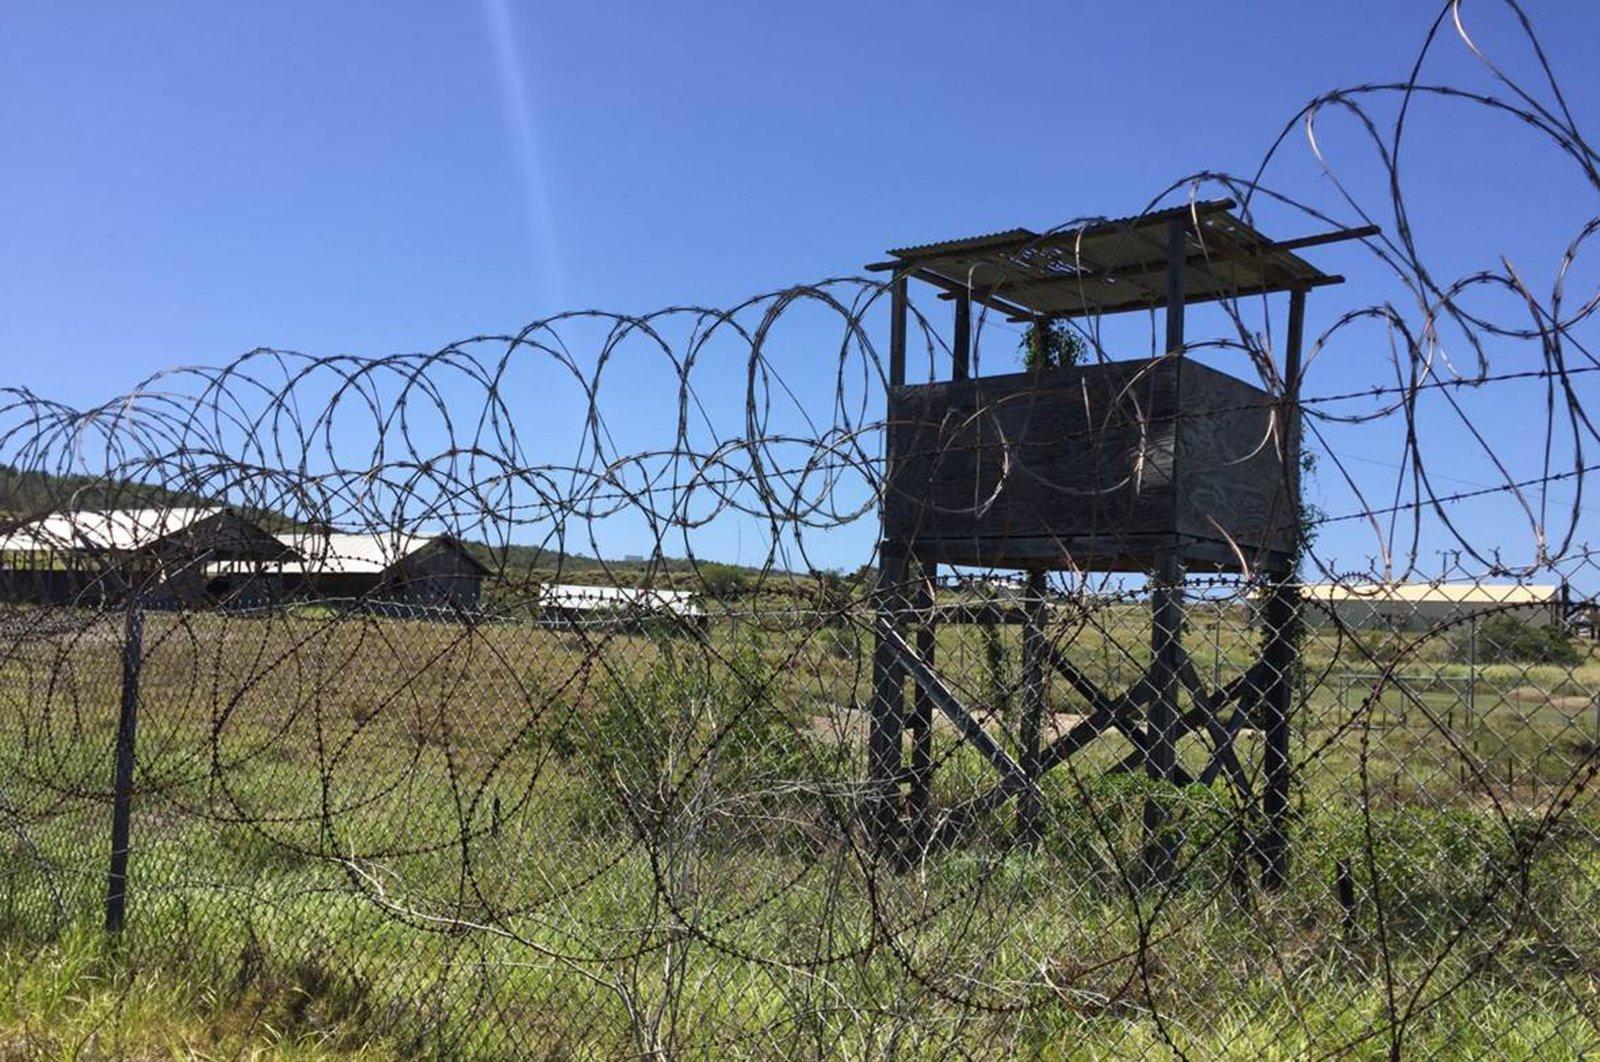 Camp X-Ray is seen at Guantanamo Bay Naval base on March 9, 2016, in Guantanamo Bay, Cuba. (AFP Photo)